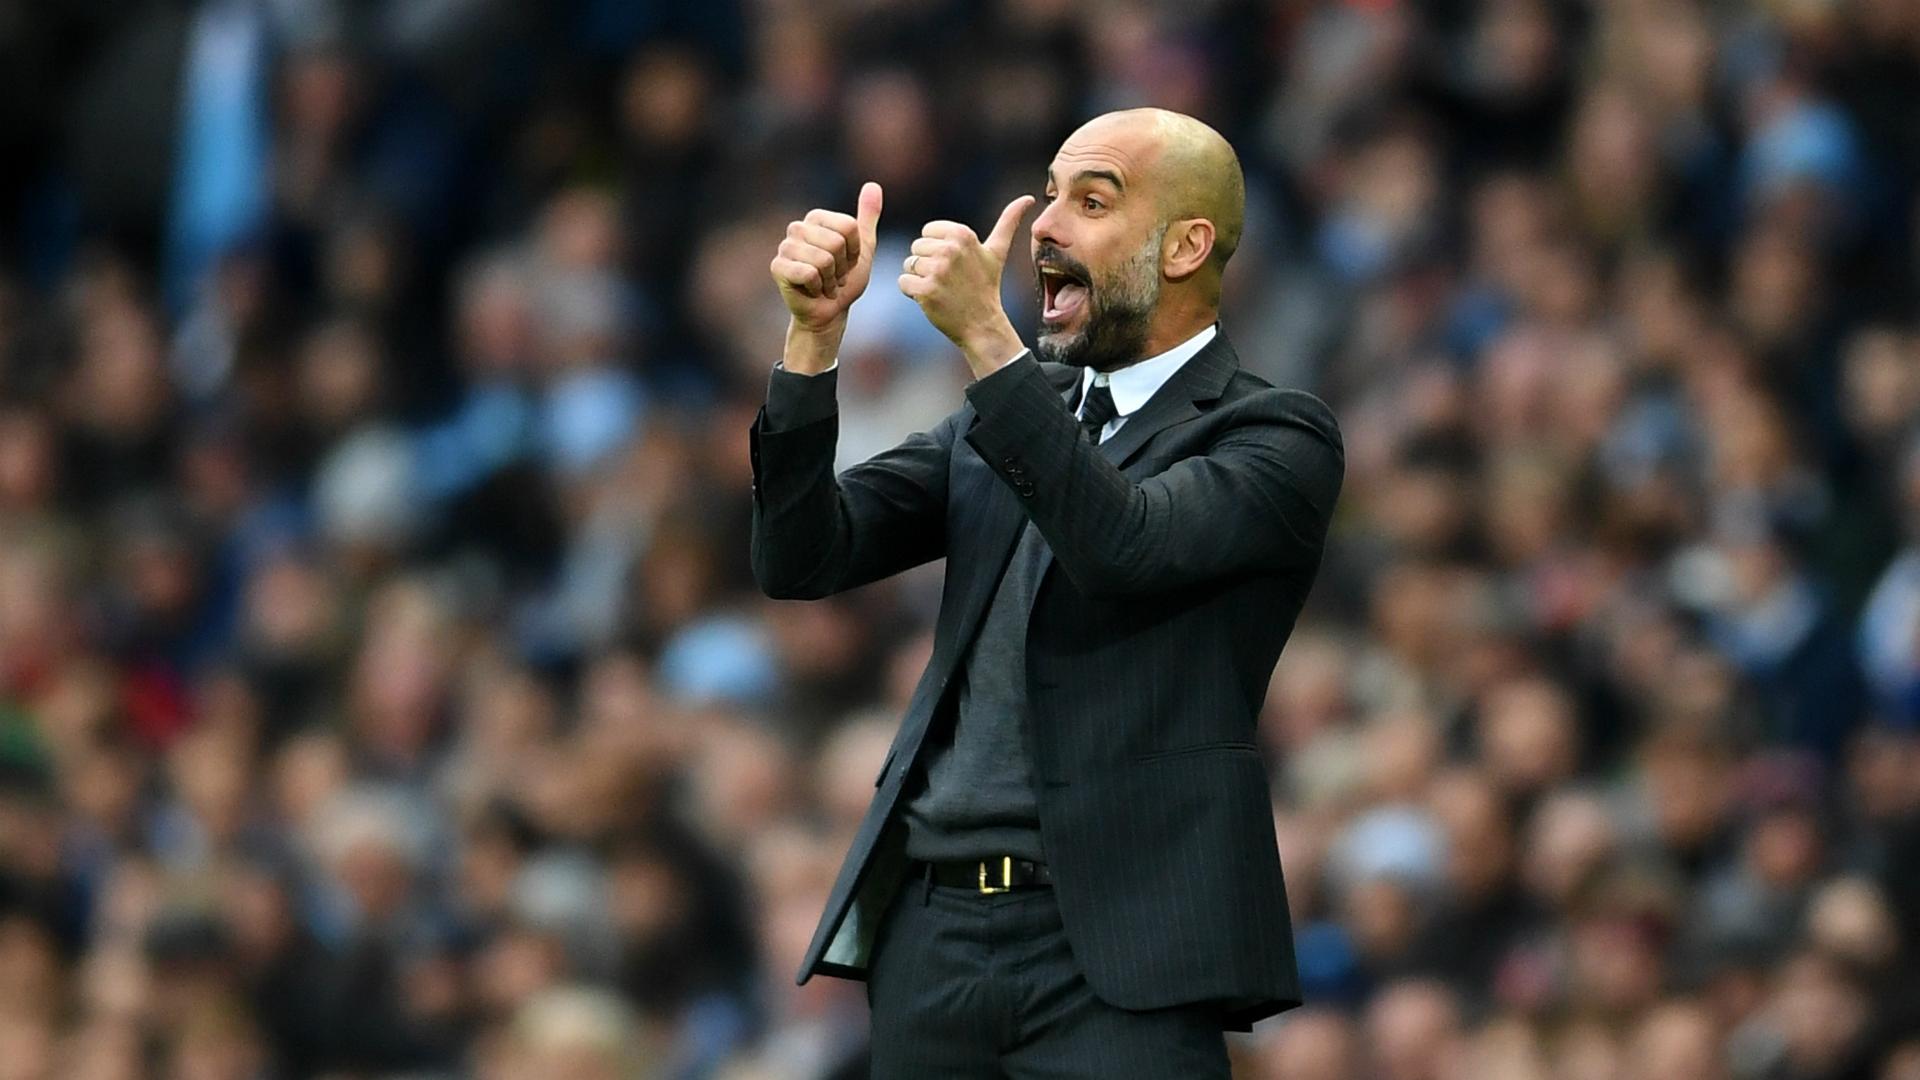 Guardiola tells Man City hierarchy: Make the Etihad noisier!